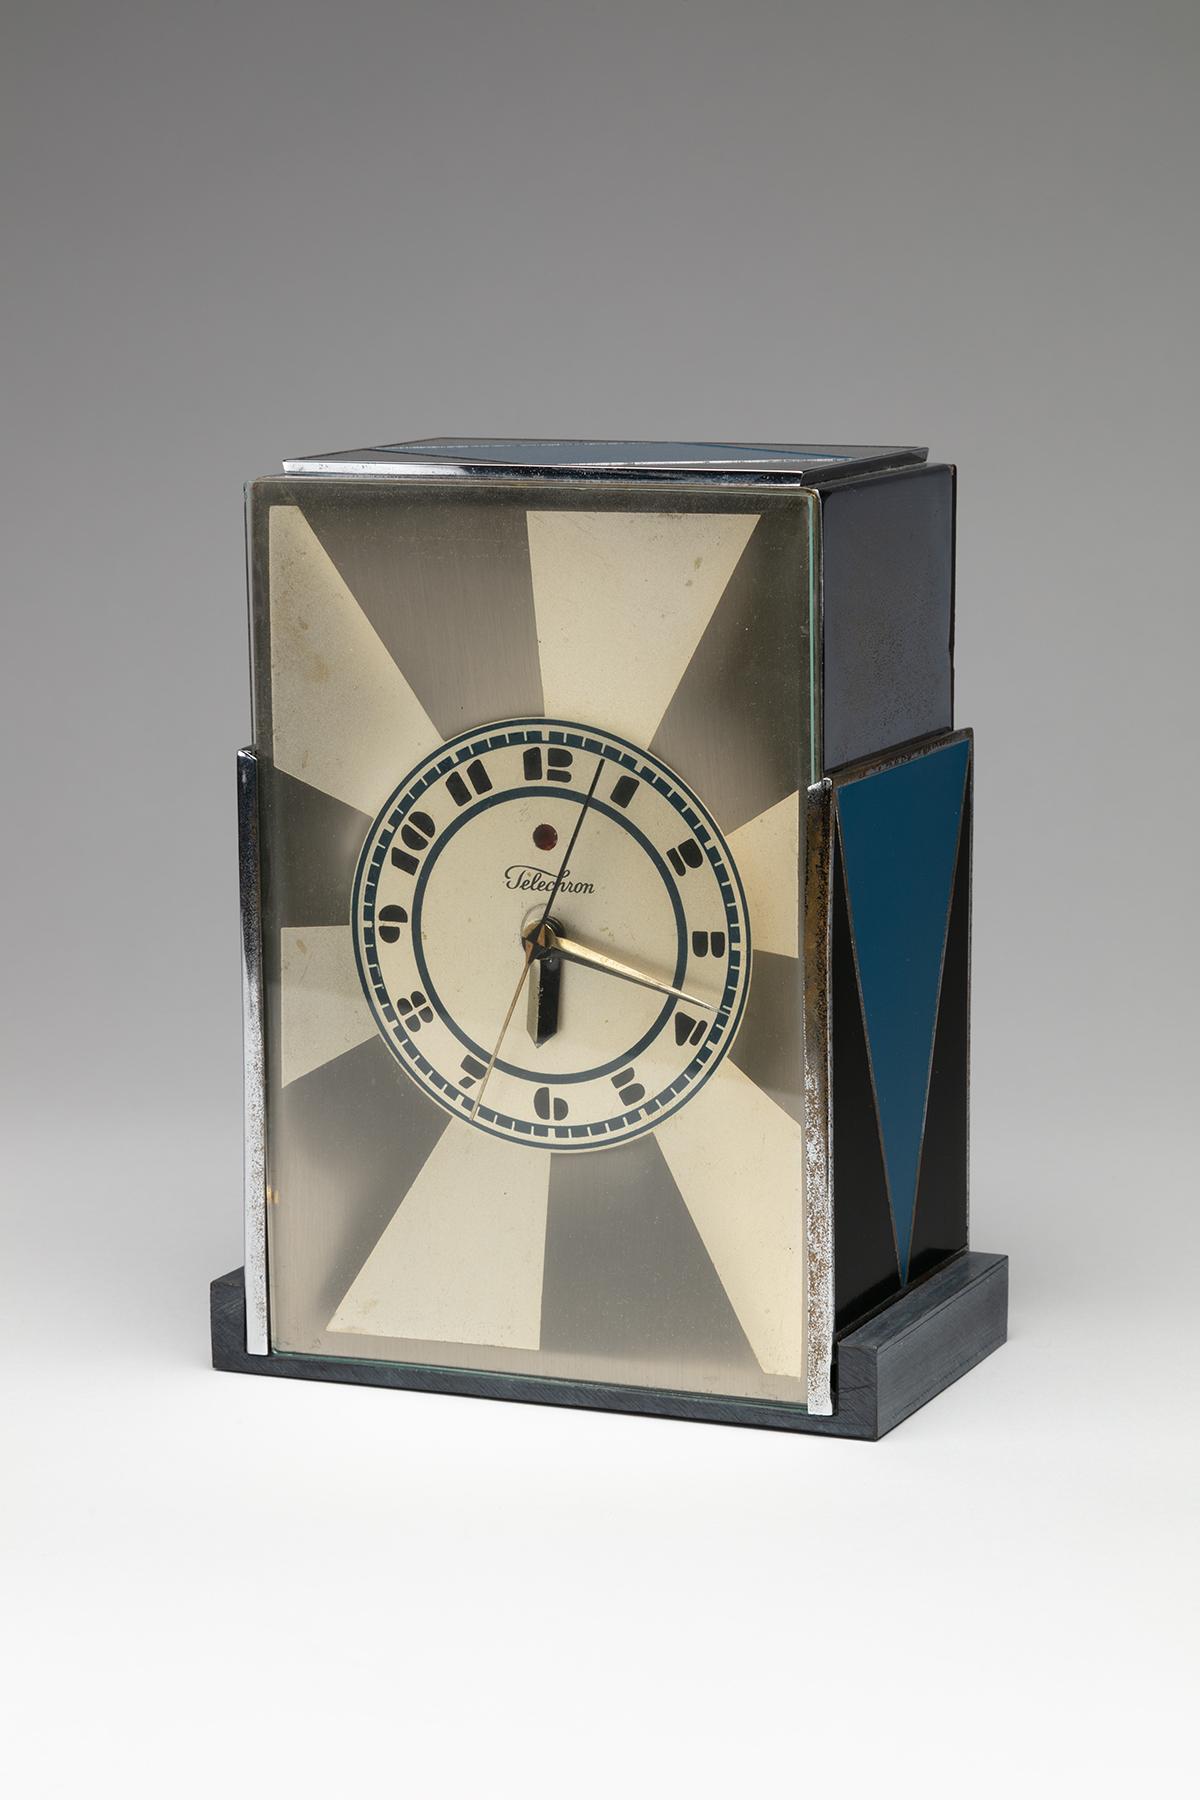 Modernique Clock designed by Paul T. Frankl